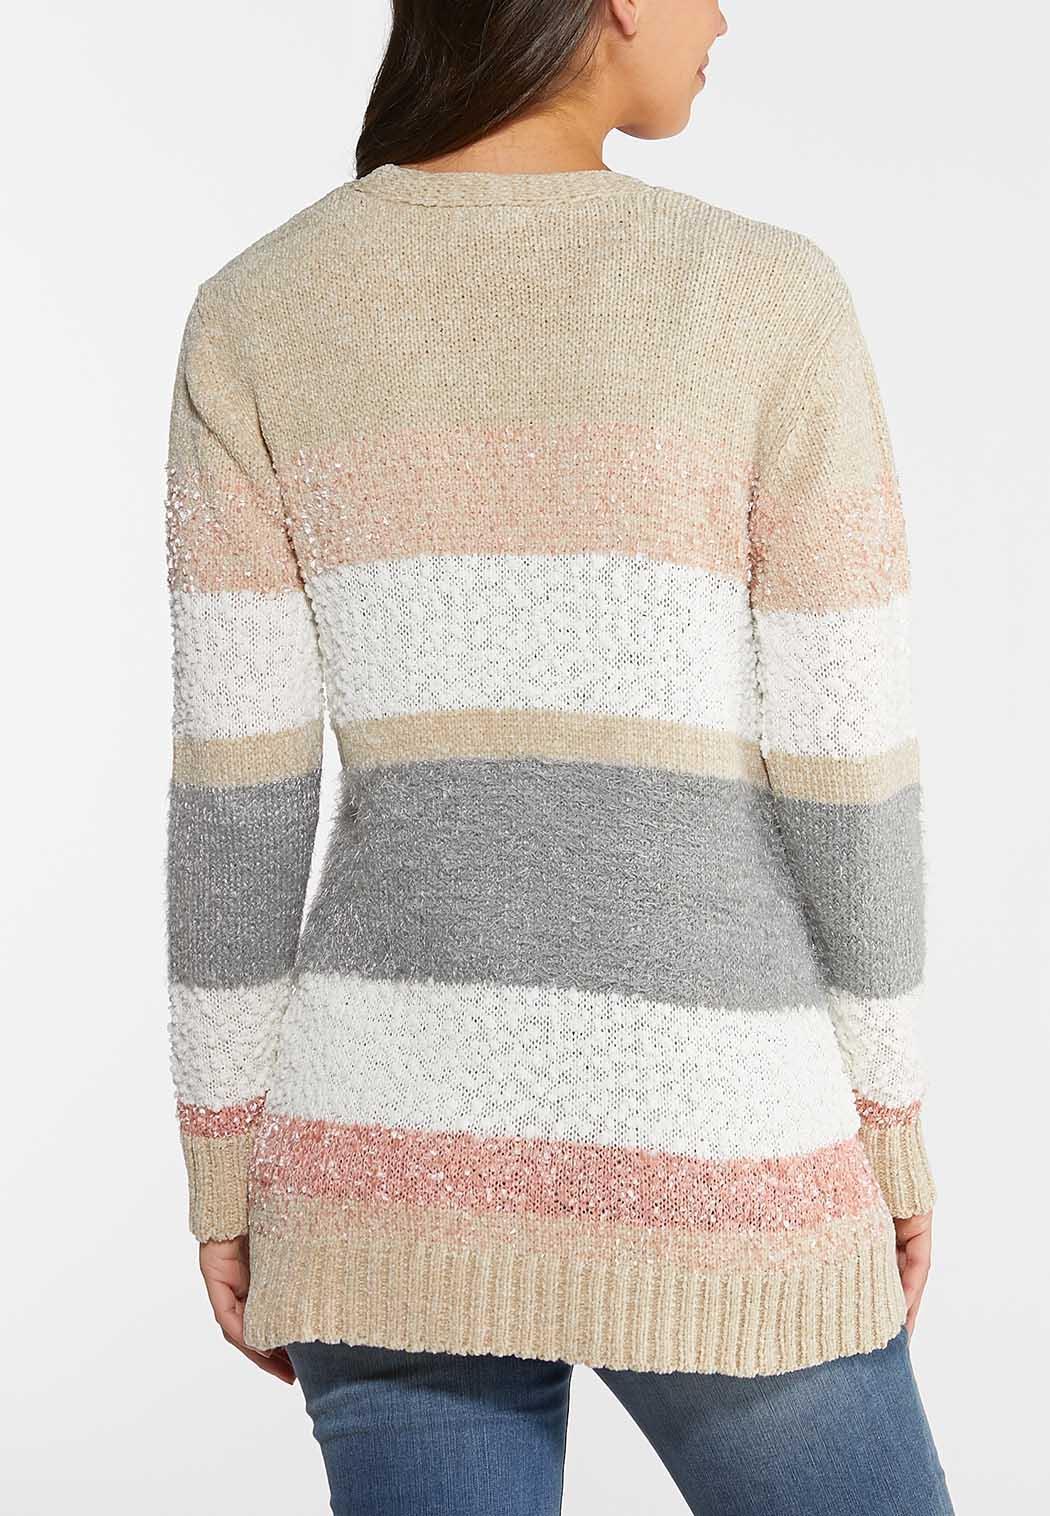 Plus Size Colorblock Chenille Cardigan (Item #43994144)